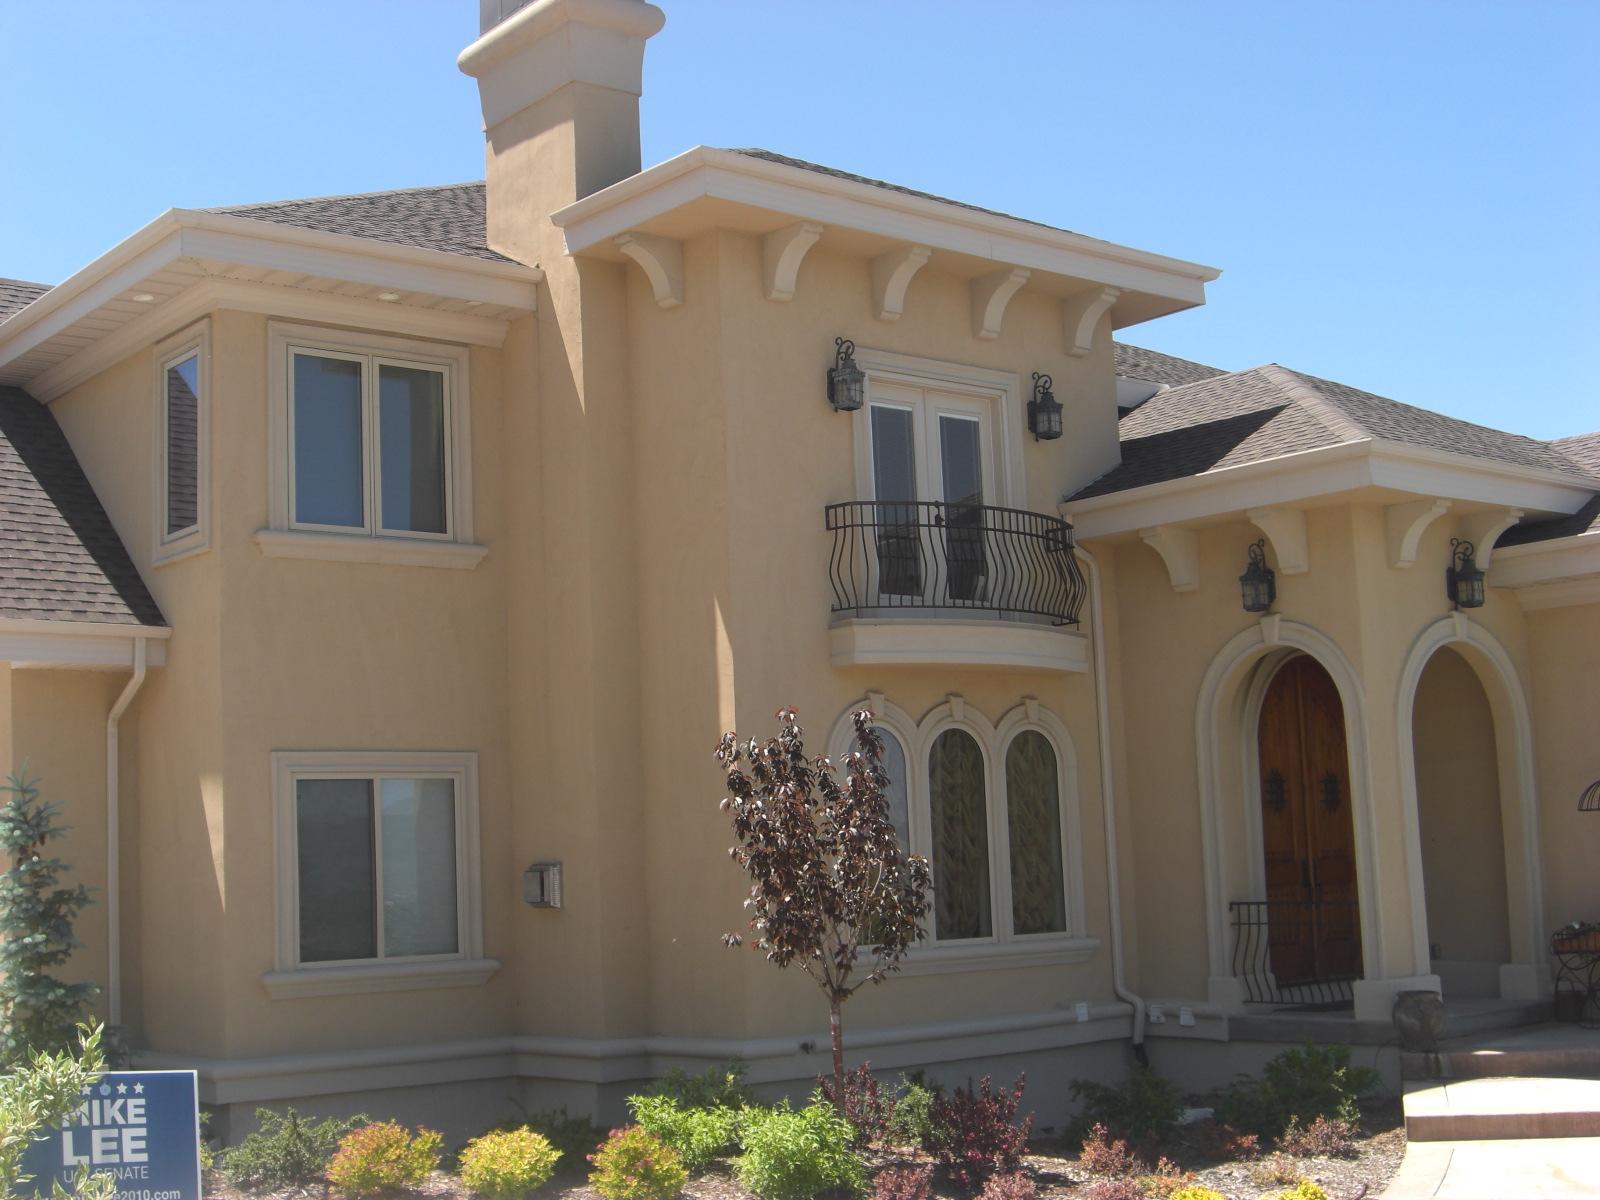 Exterior Stucco Ideas Affordable Sherwin Williams Exterior Stucco